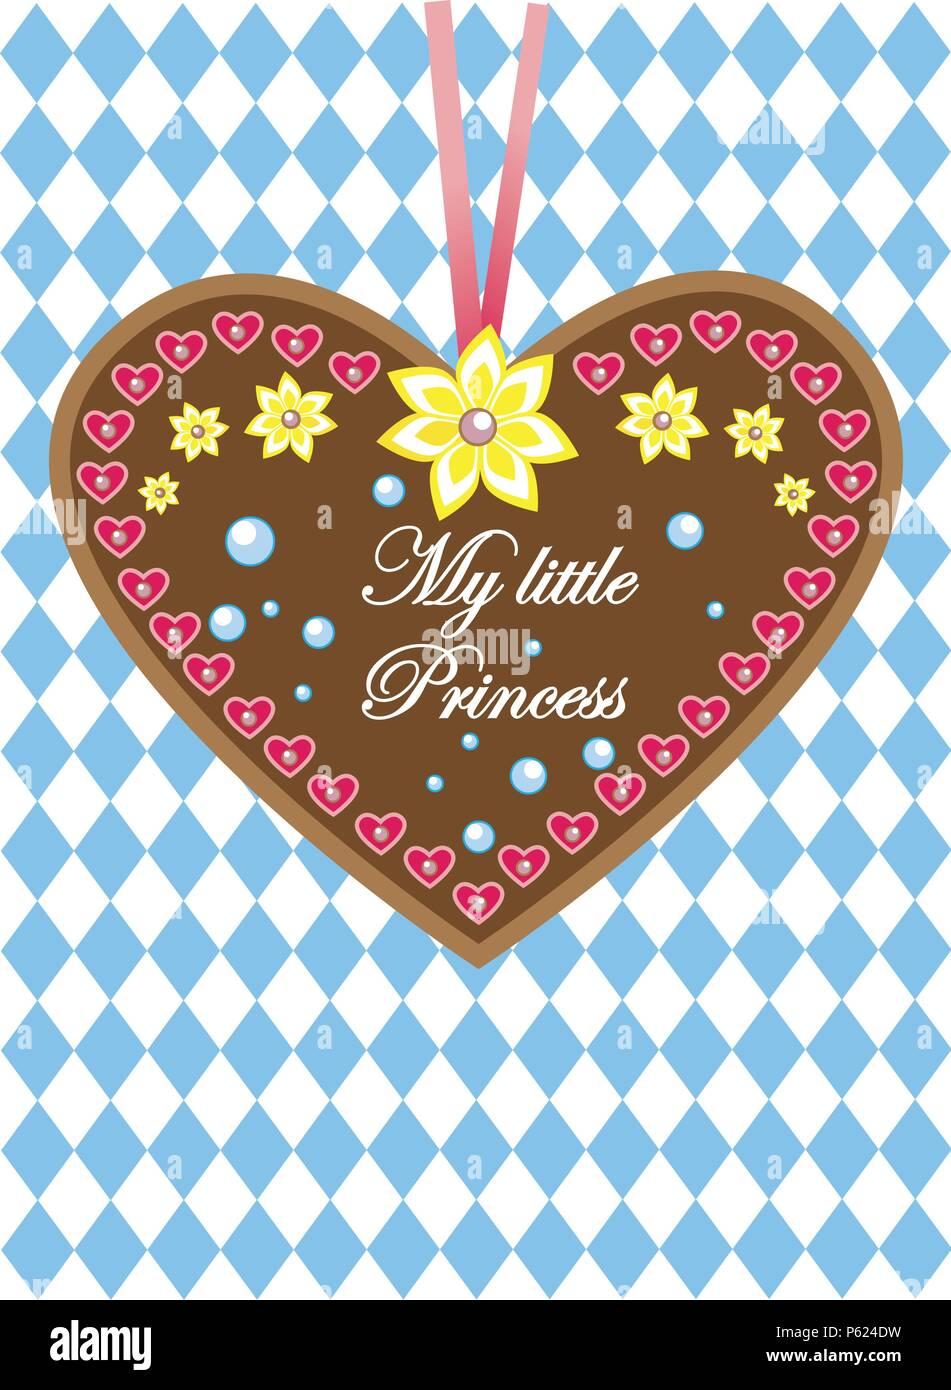 oktoberfest gingerbread heart - greetings / Gruß von der Wiesn! - Stock Image